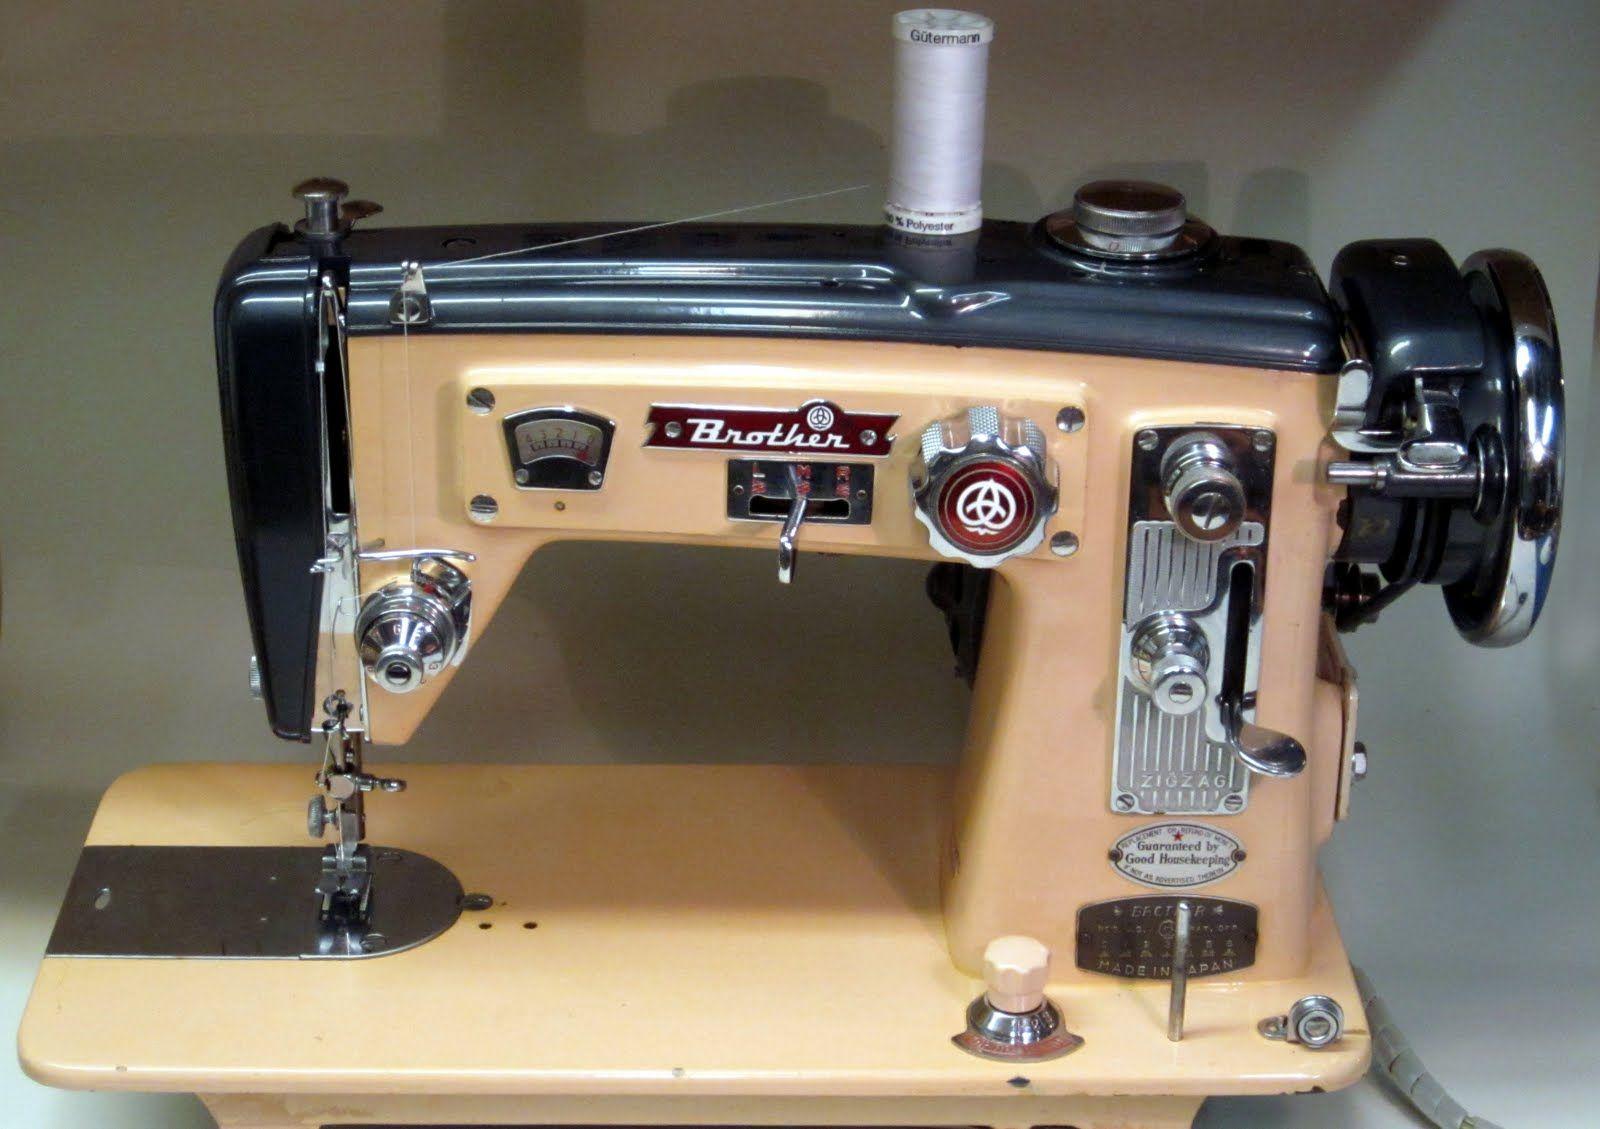 Story Telling Sewing Machine Vintage Sewing Machines Sewing Machine Manuals